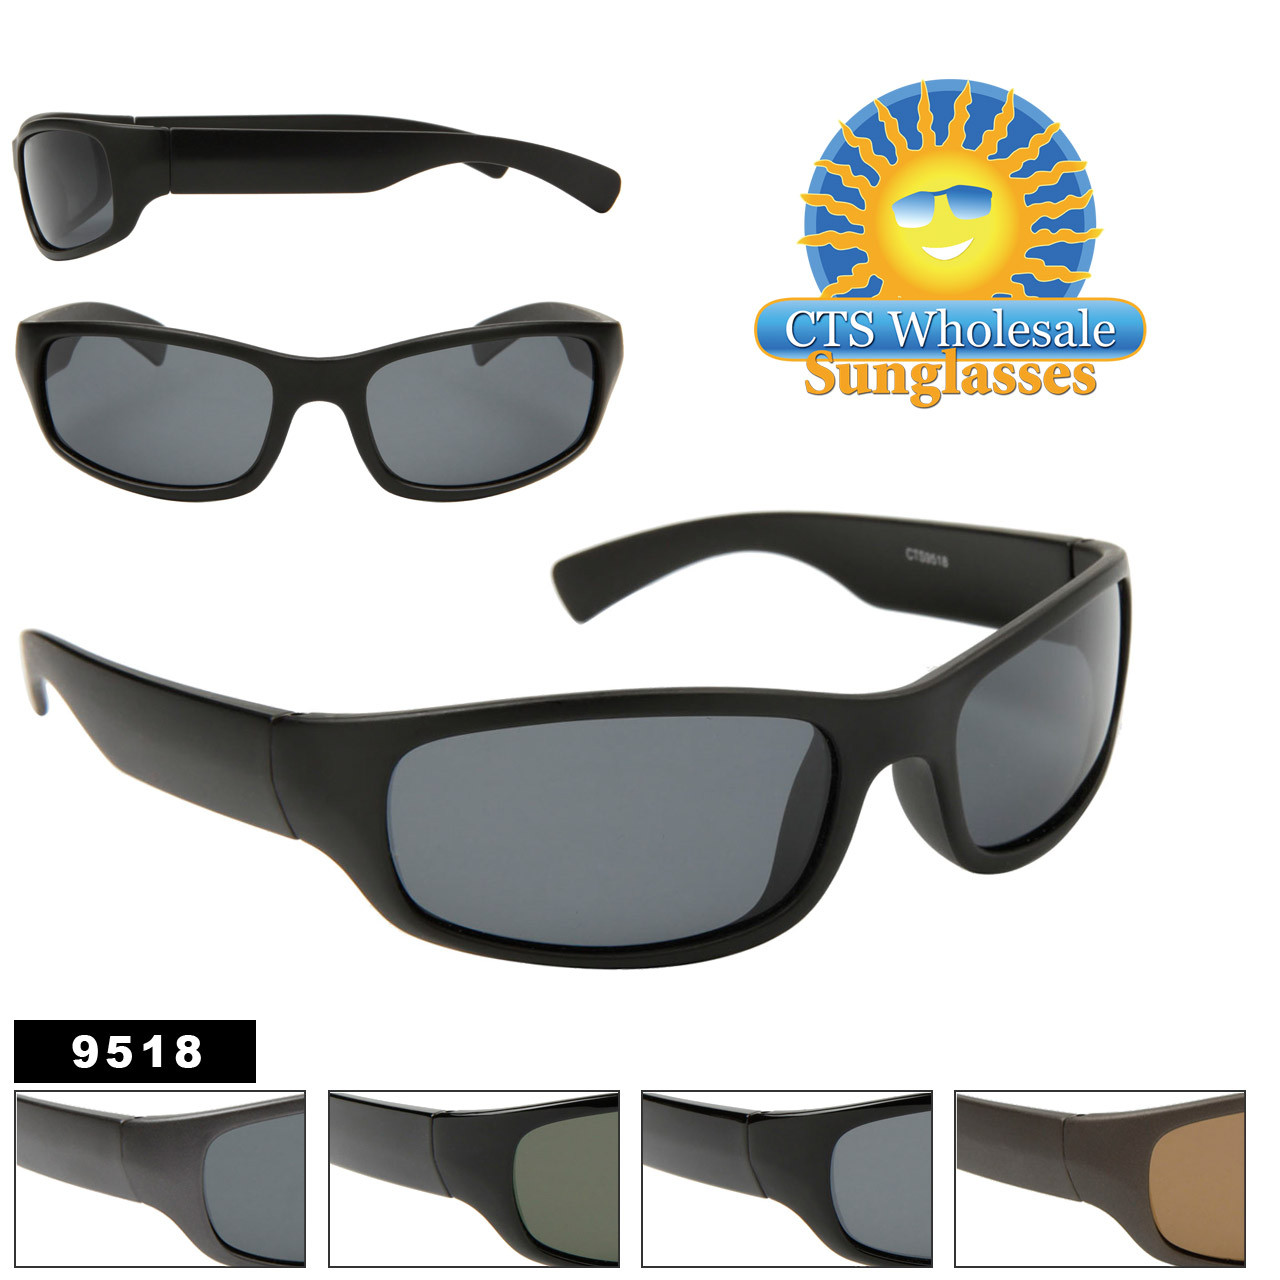 #9518 Polarized Sunglasses